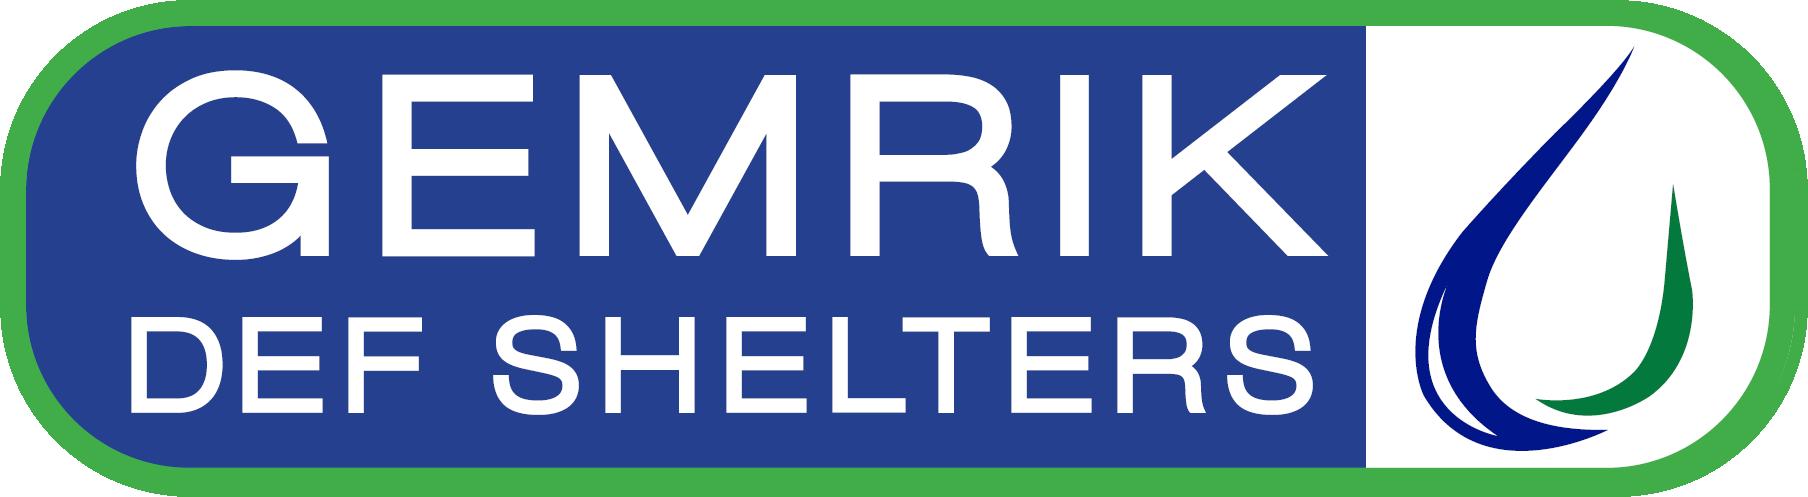 Gemrik DEF Shelters by Fluidall